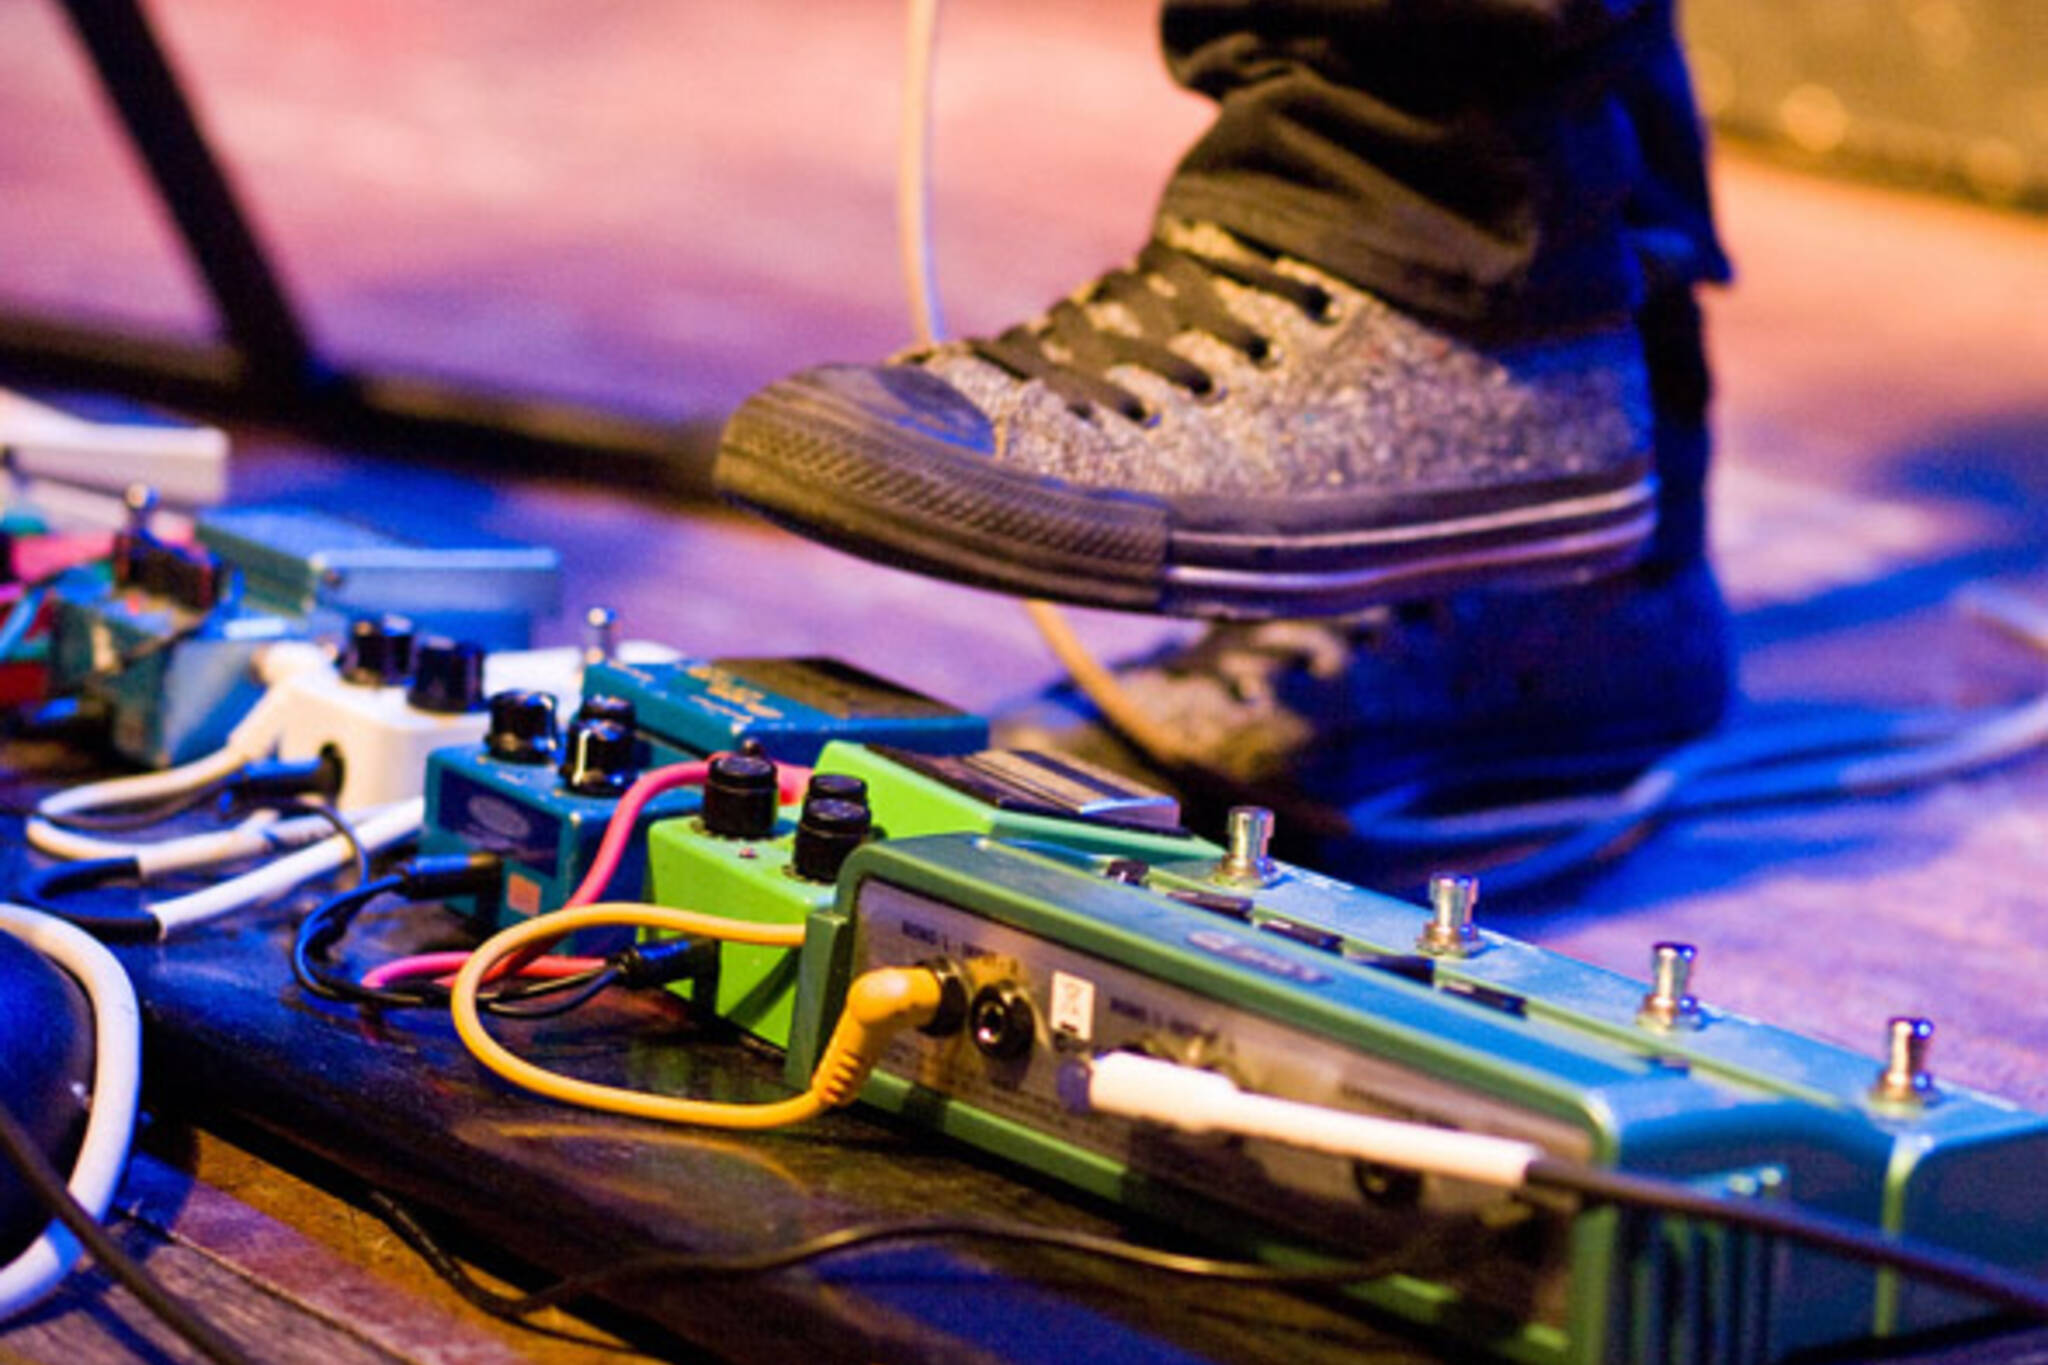 Hot ticket concert listsings toronto live music nouvelle vague, these electric lives, asobi seksu, dinosaur bones